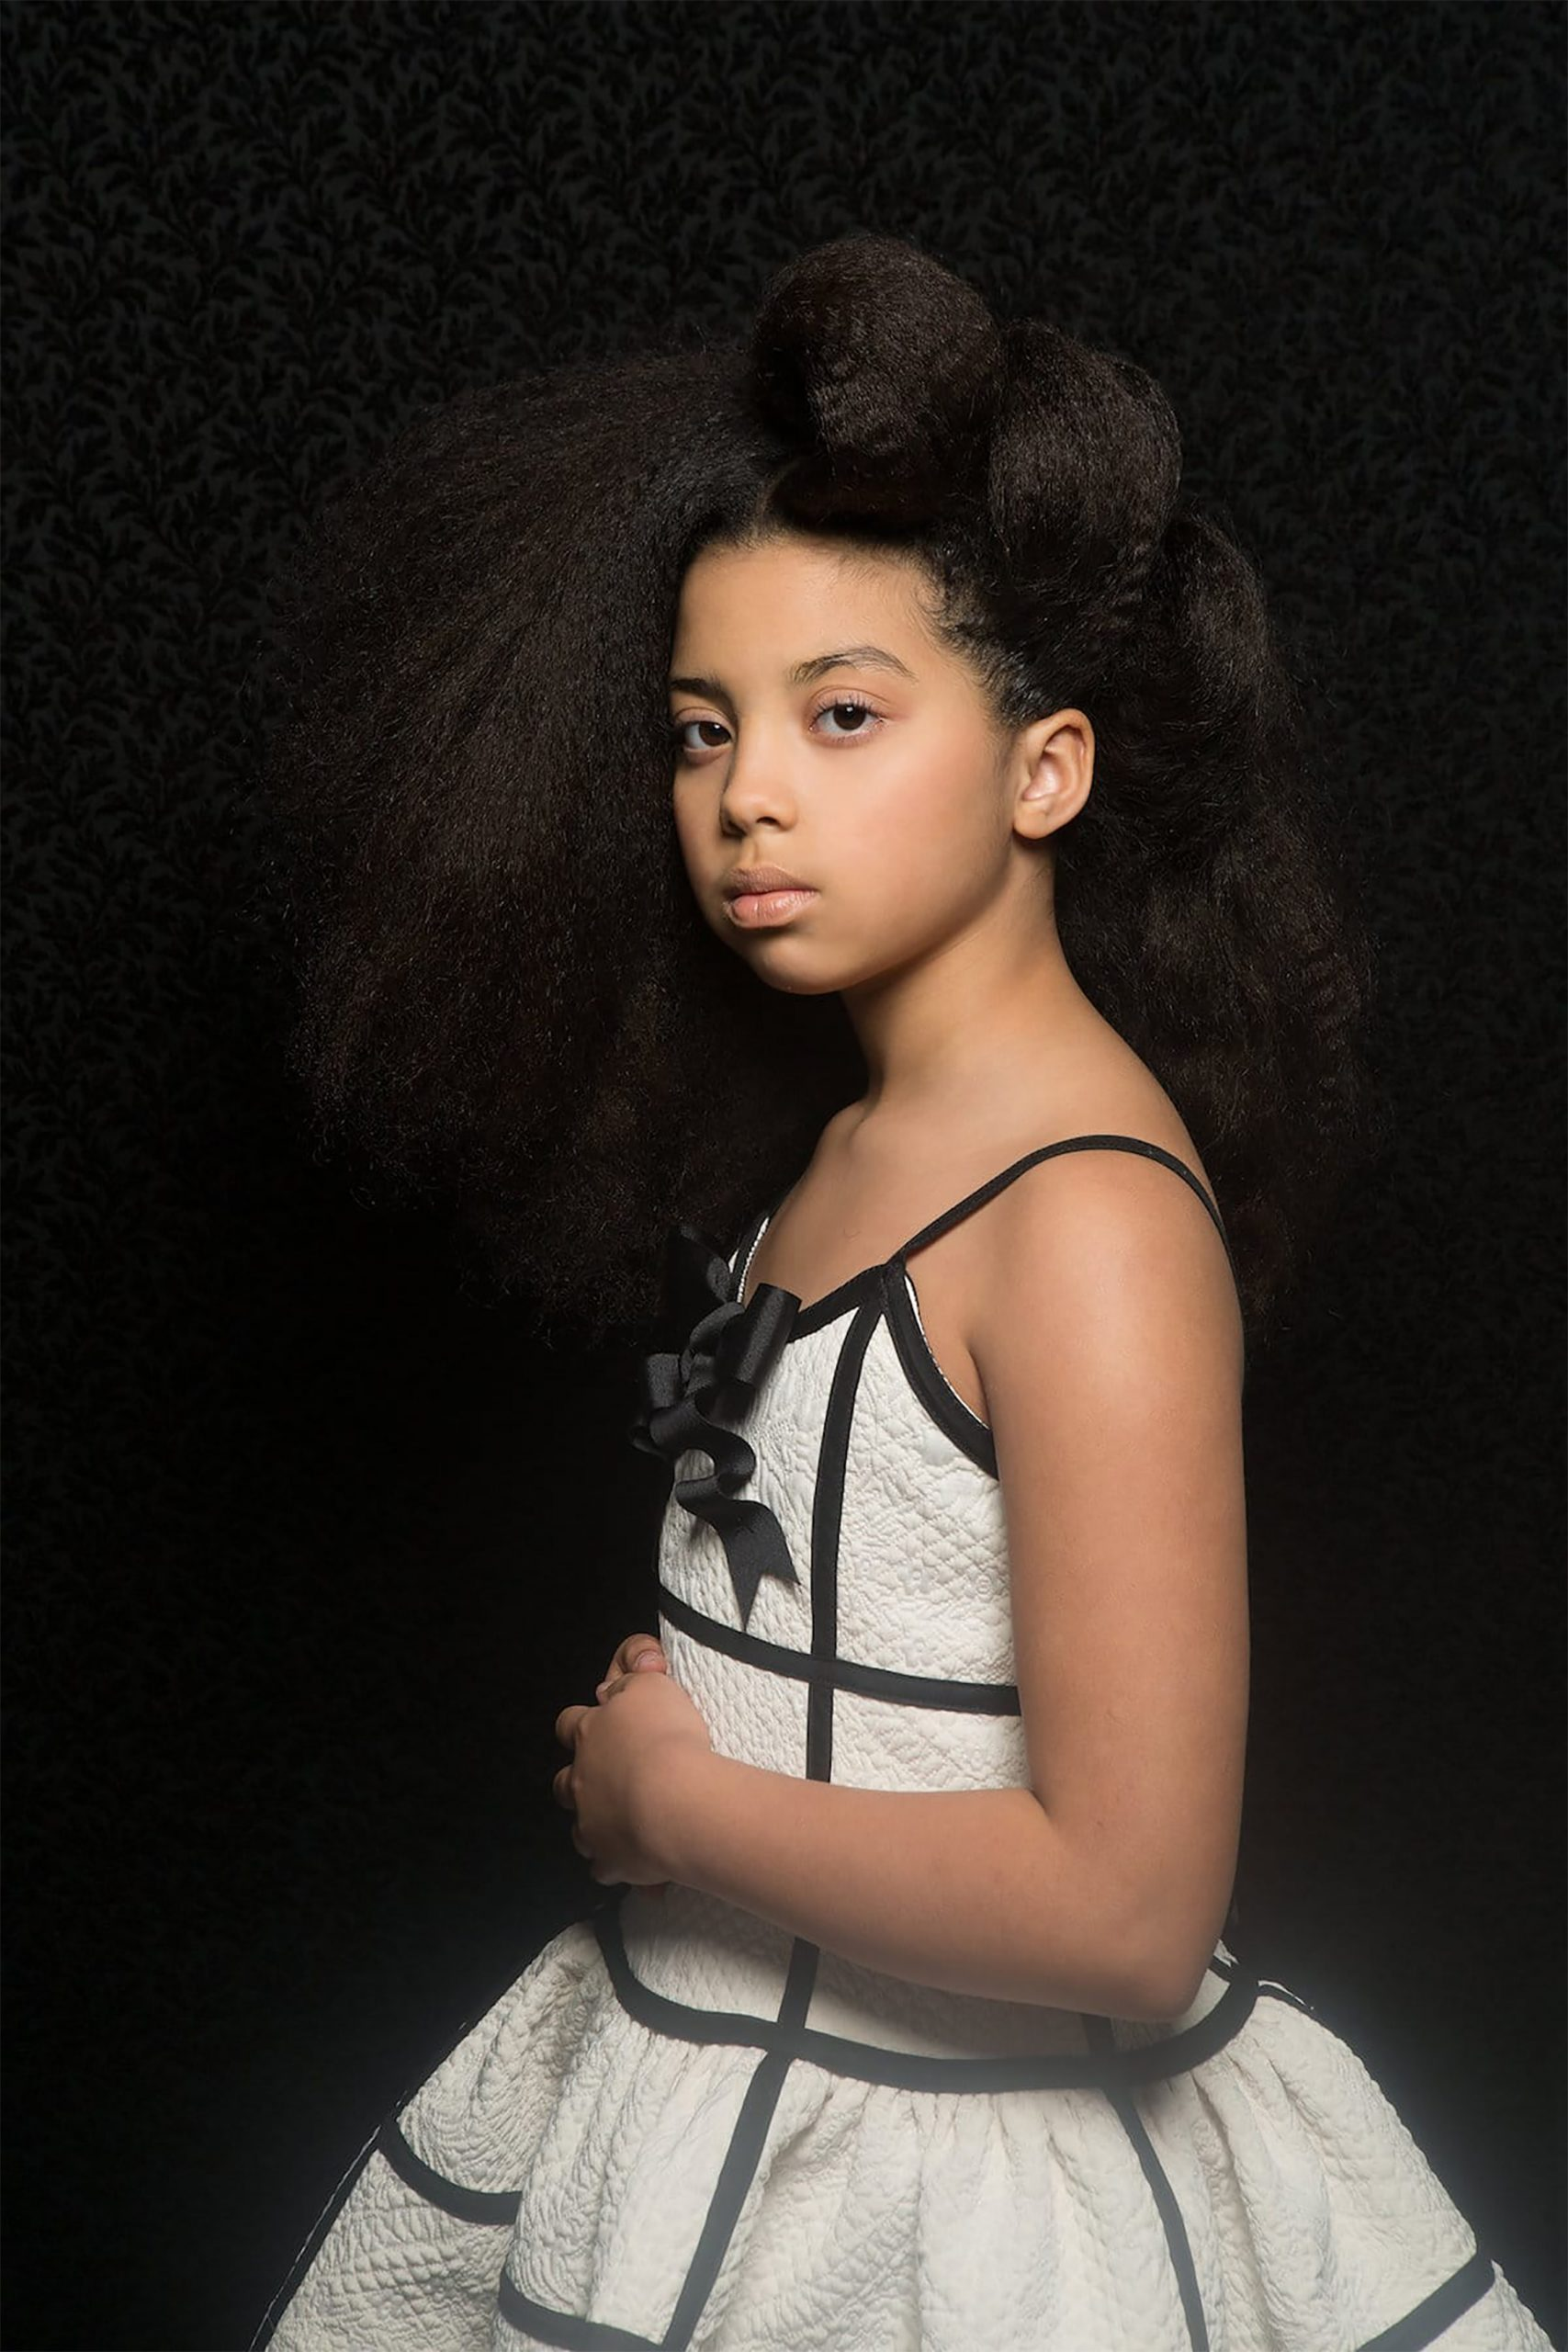 Afro Art, creative soul, capelli strutturati ragazze di colore